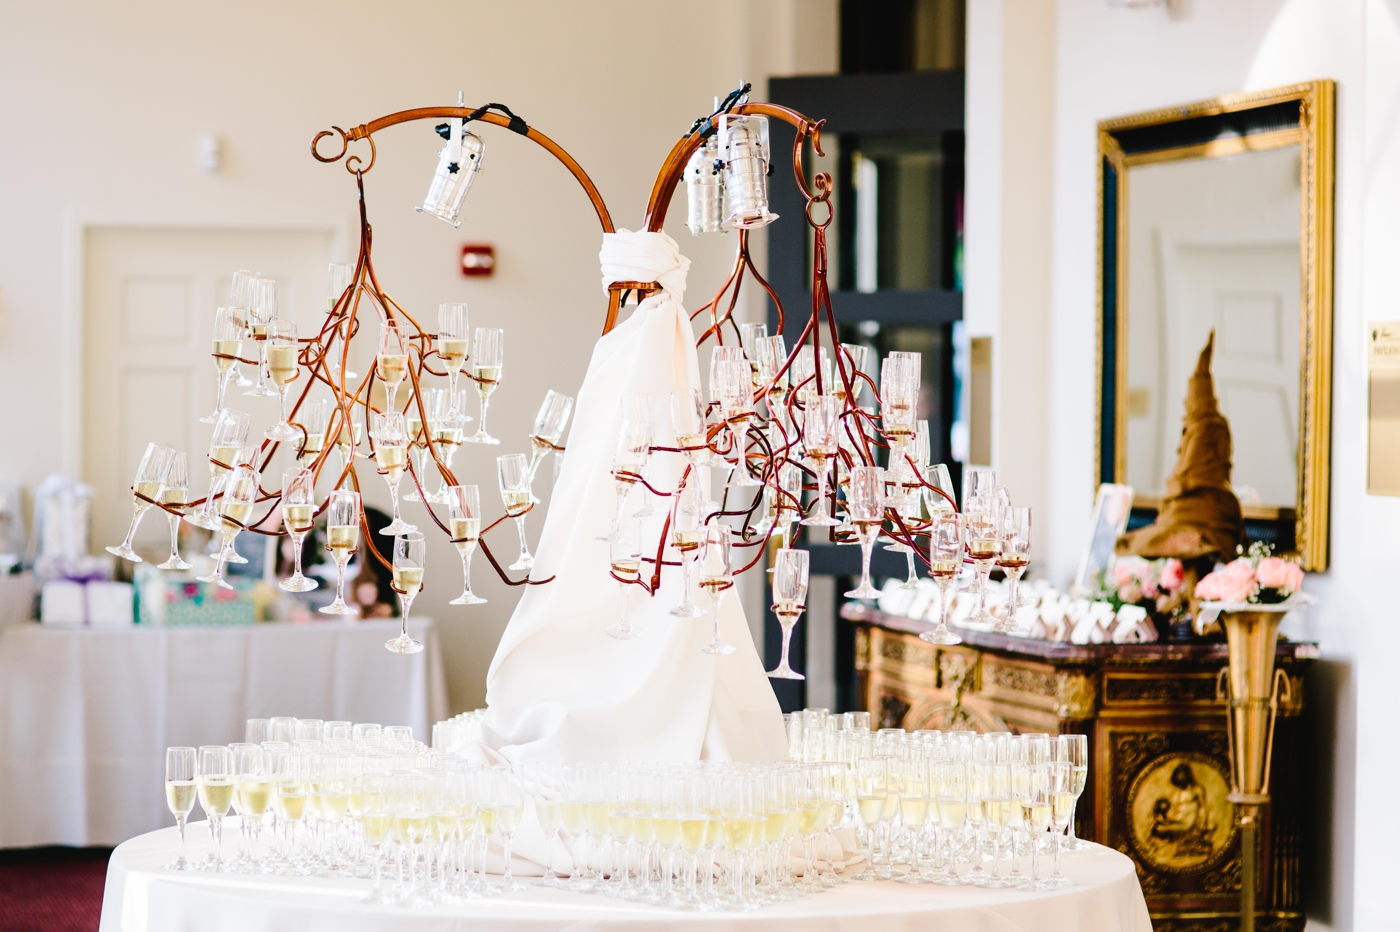 chicago-fine-art-wedding-photography-svihra17